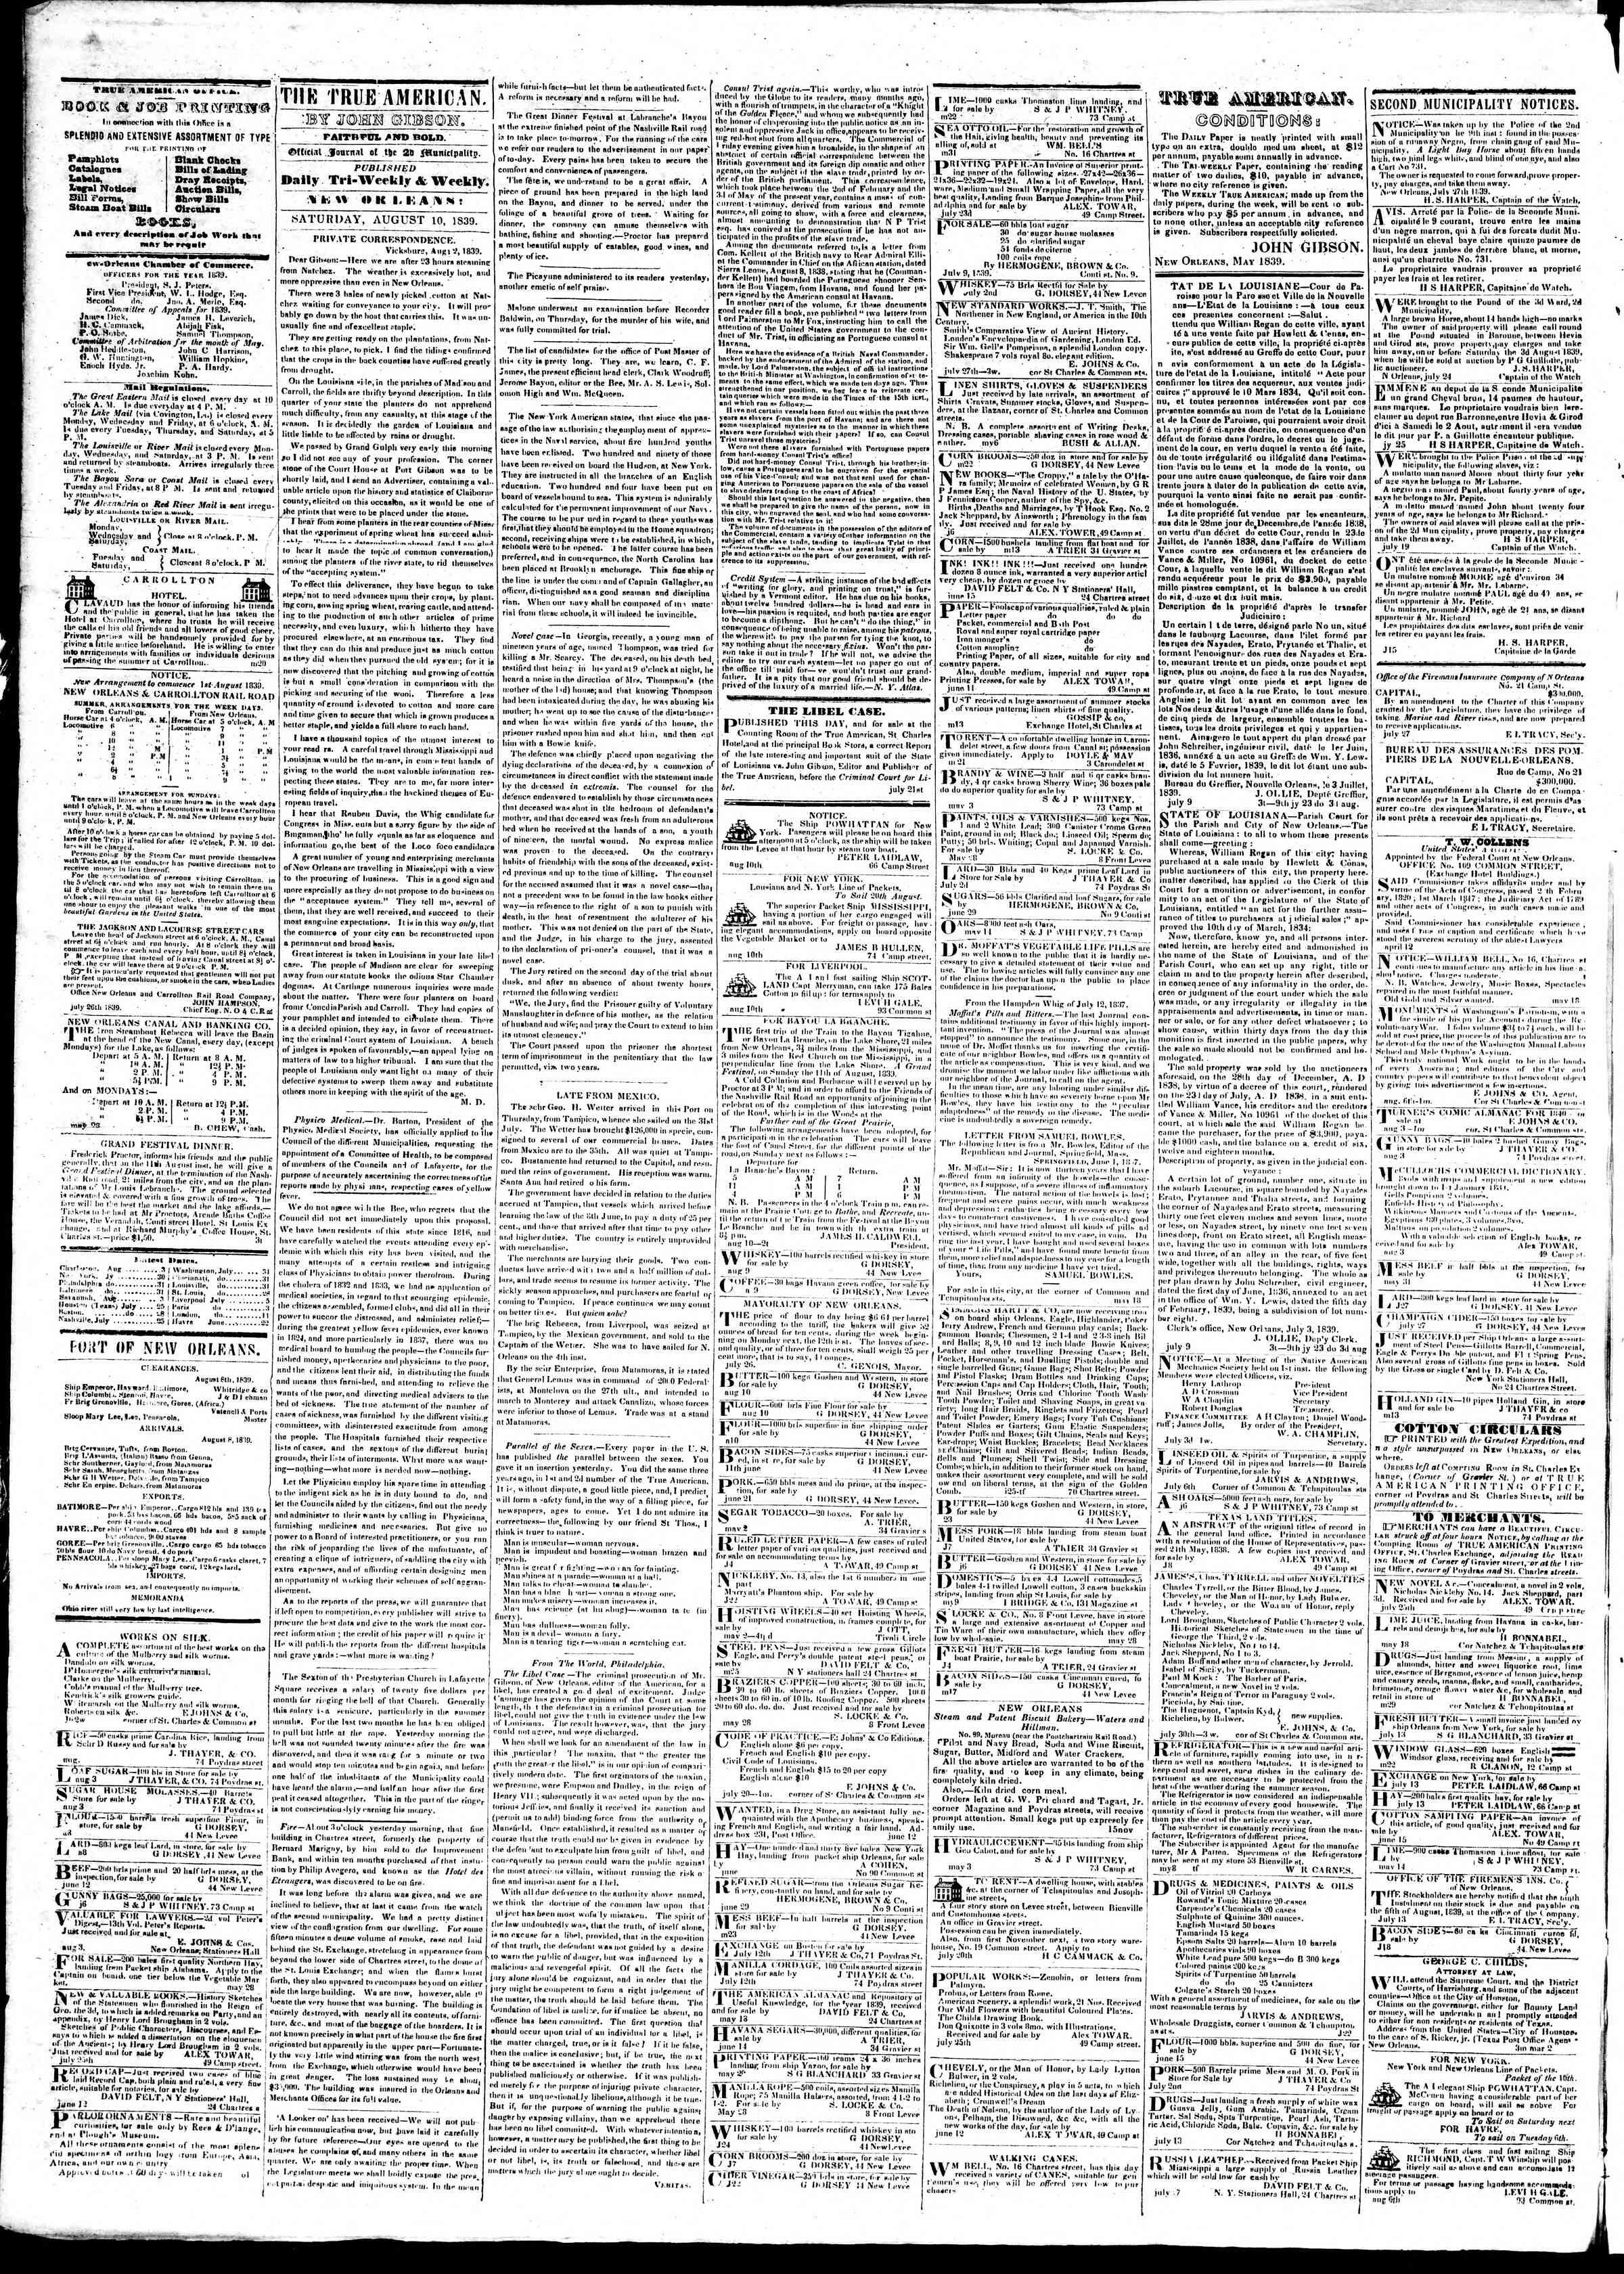 August 10, 1839 Tarihli True American Gazetesi Sayfa 2